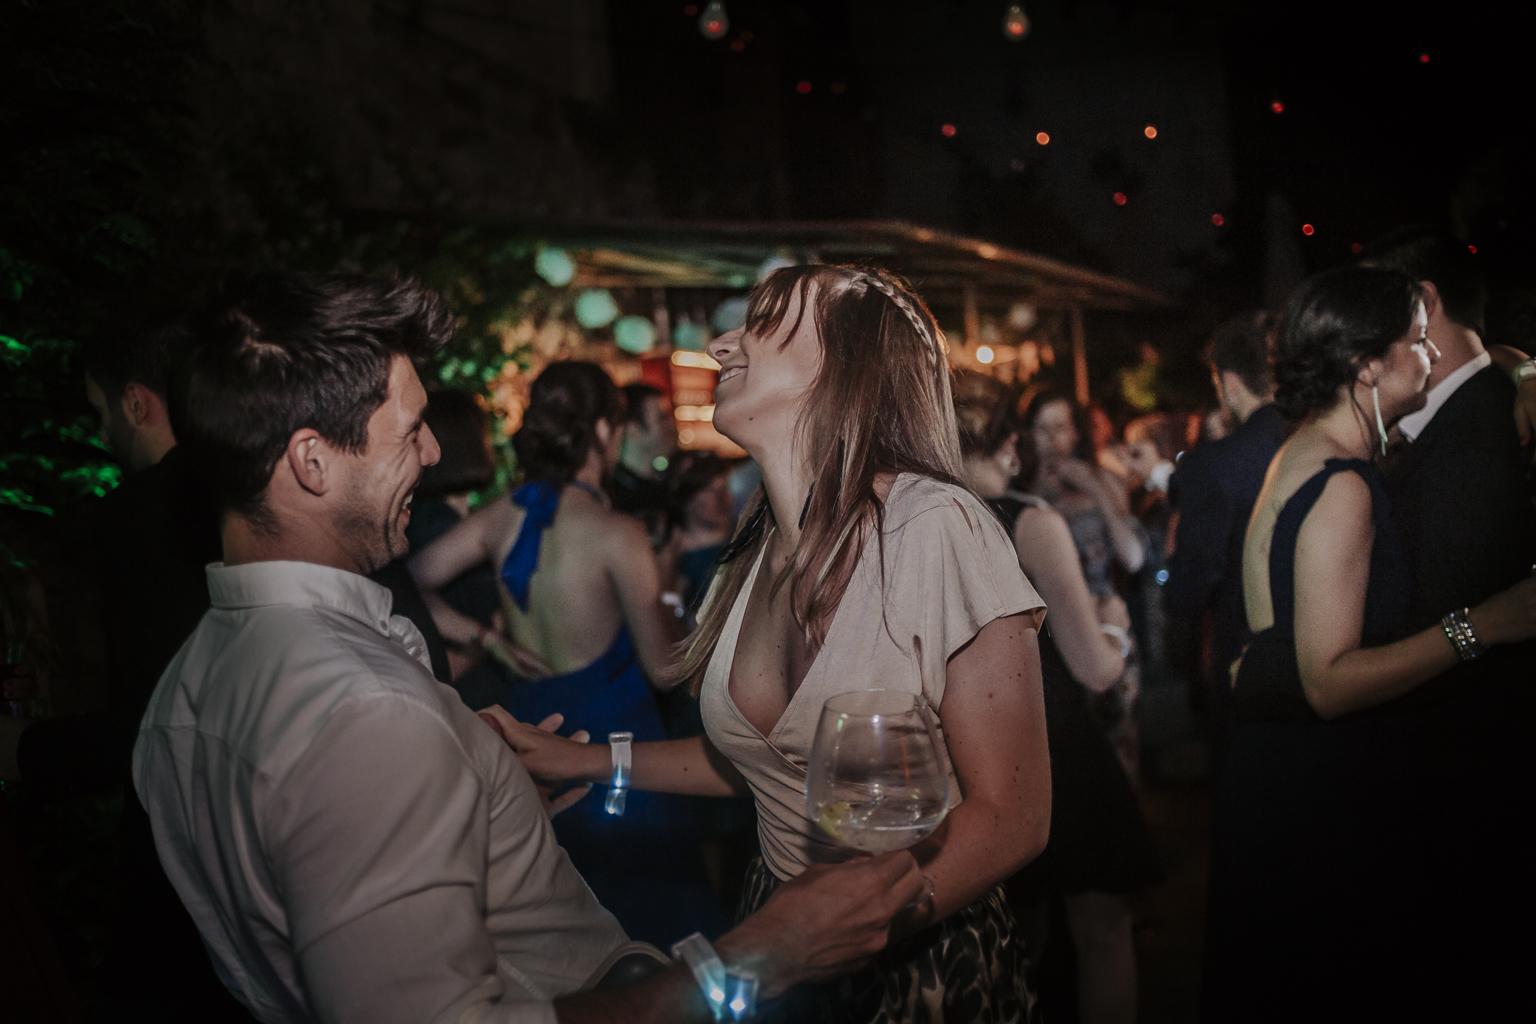 Fot grafo de boda barcelona el foll boda rom ntica - Fotografo en barcelona ...